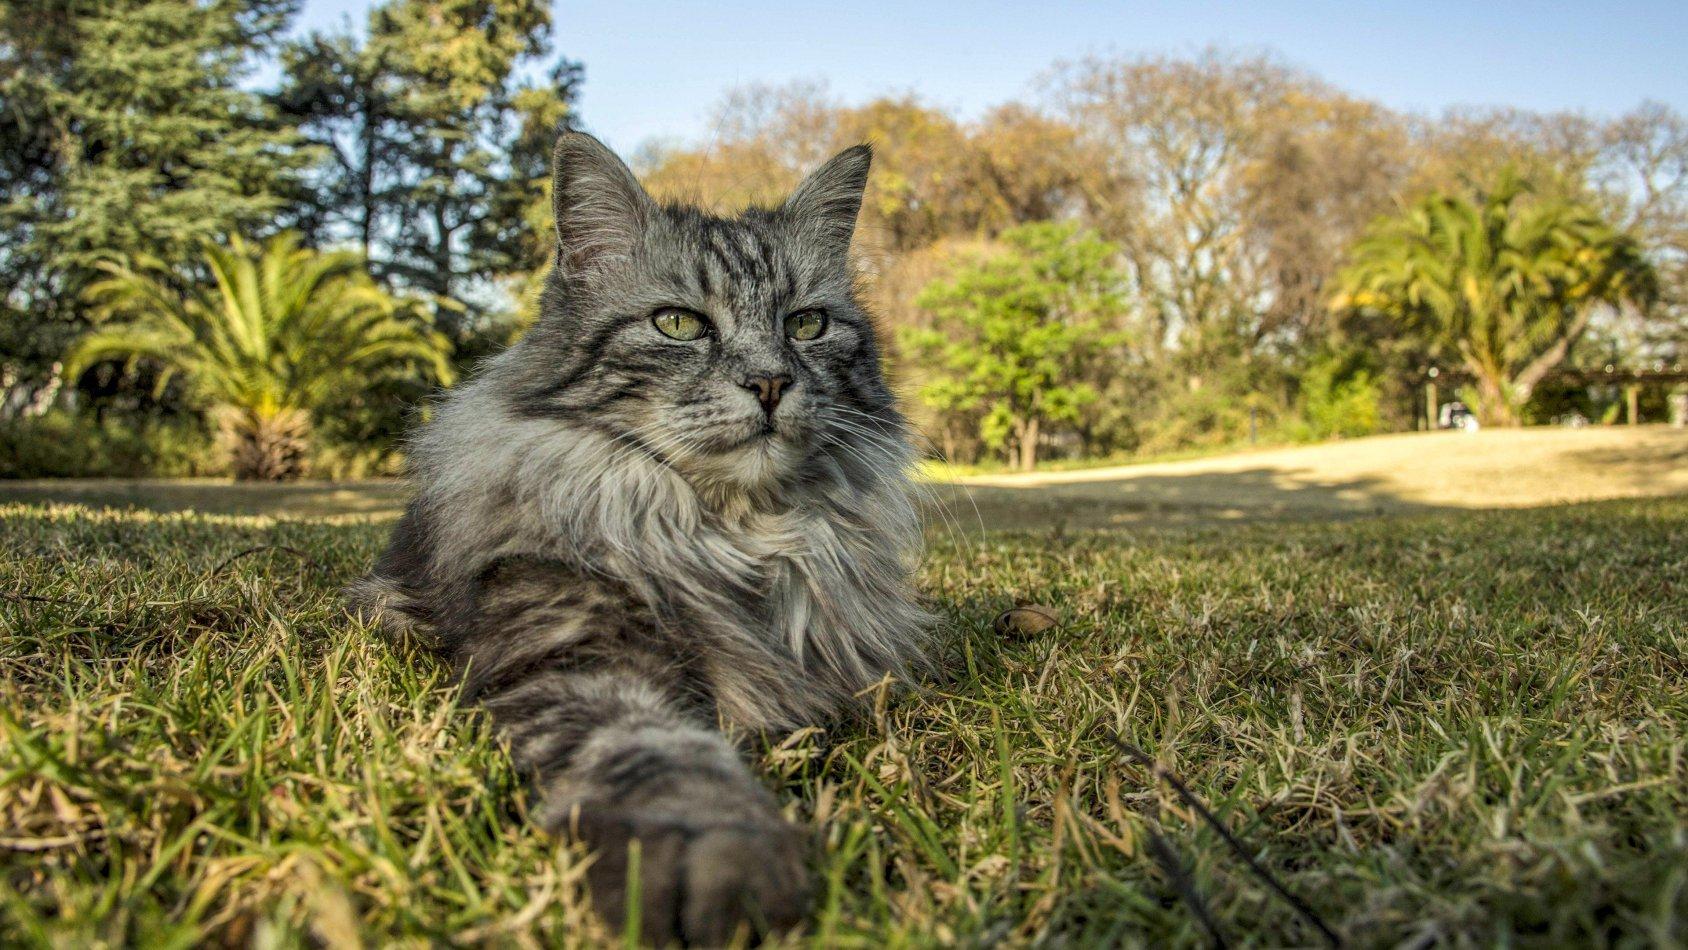 Kattens själ